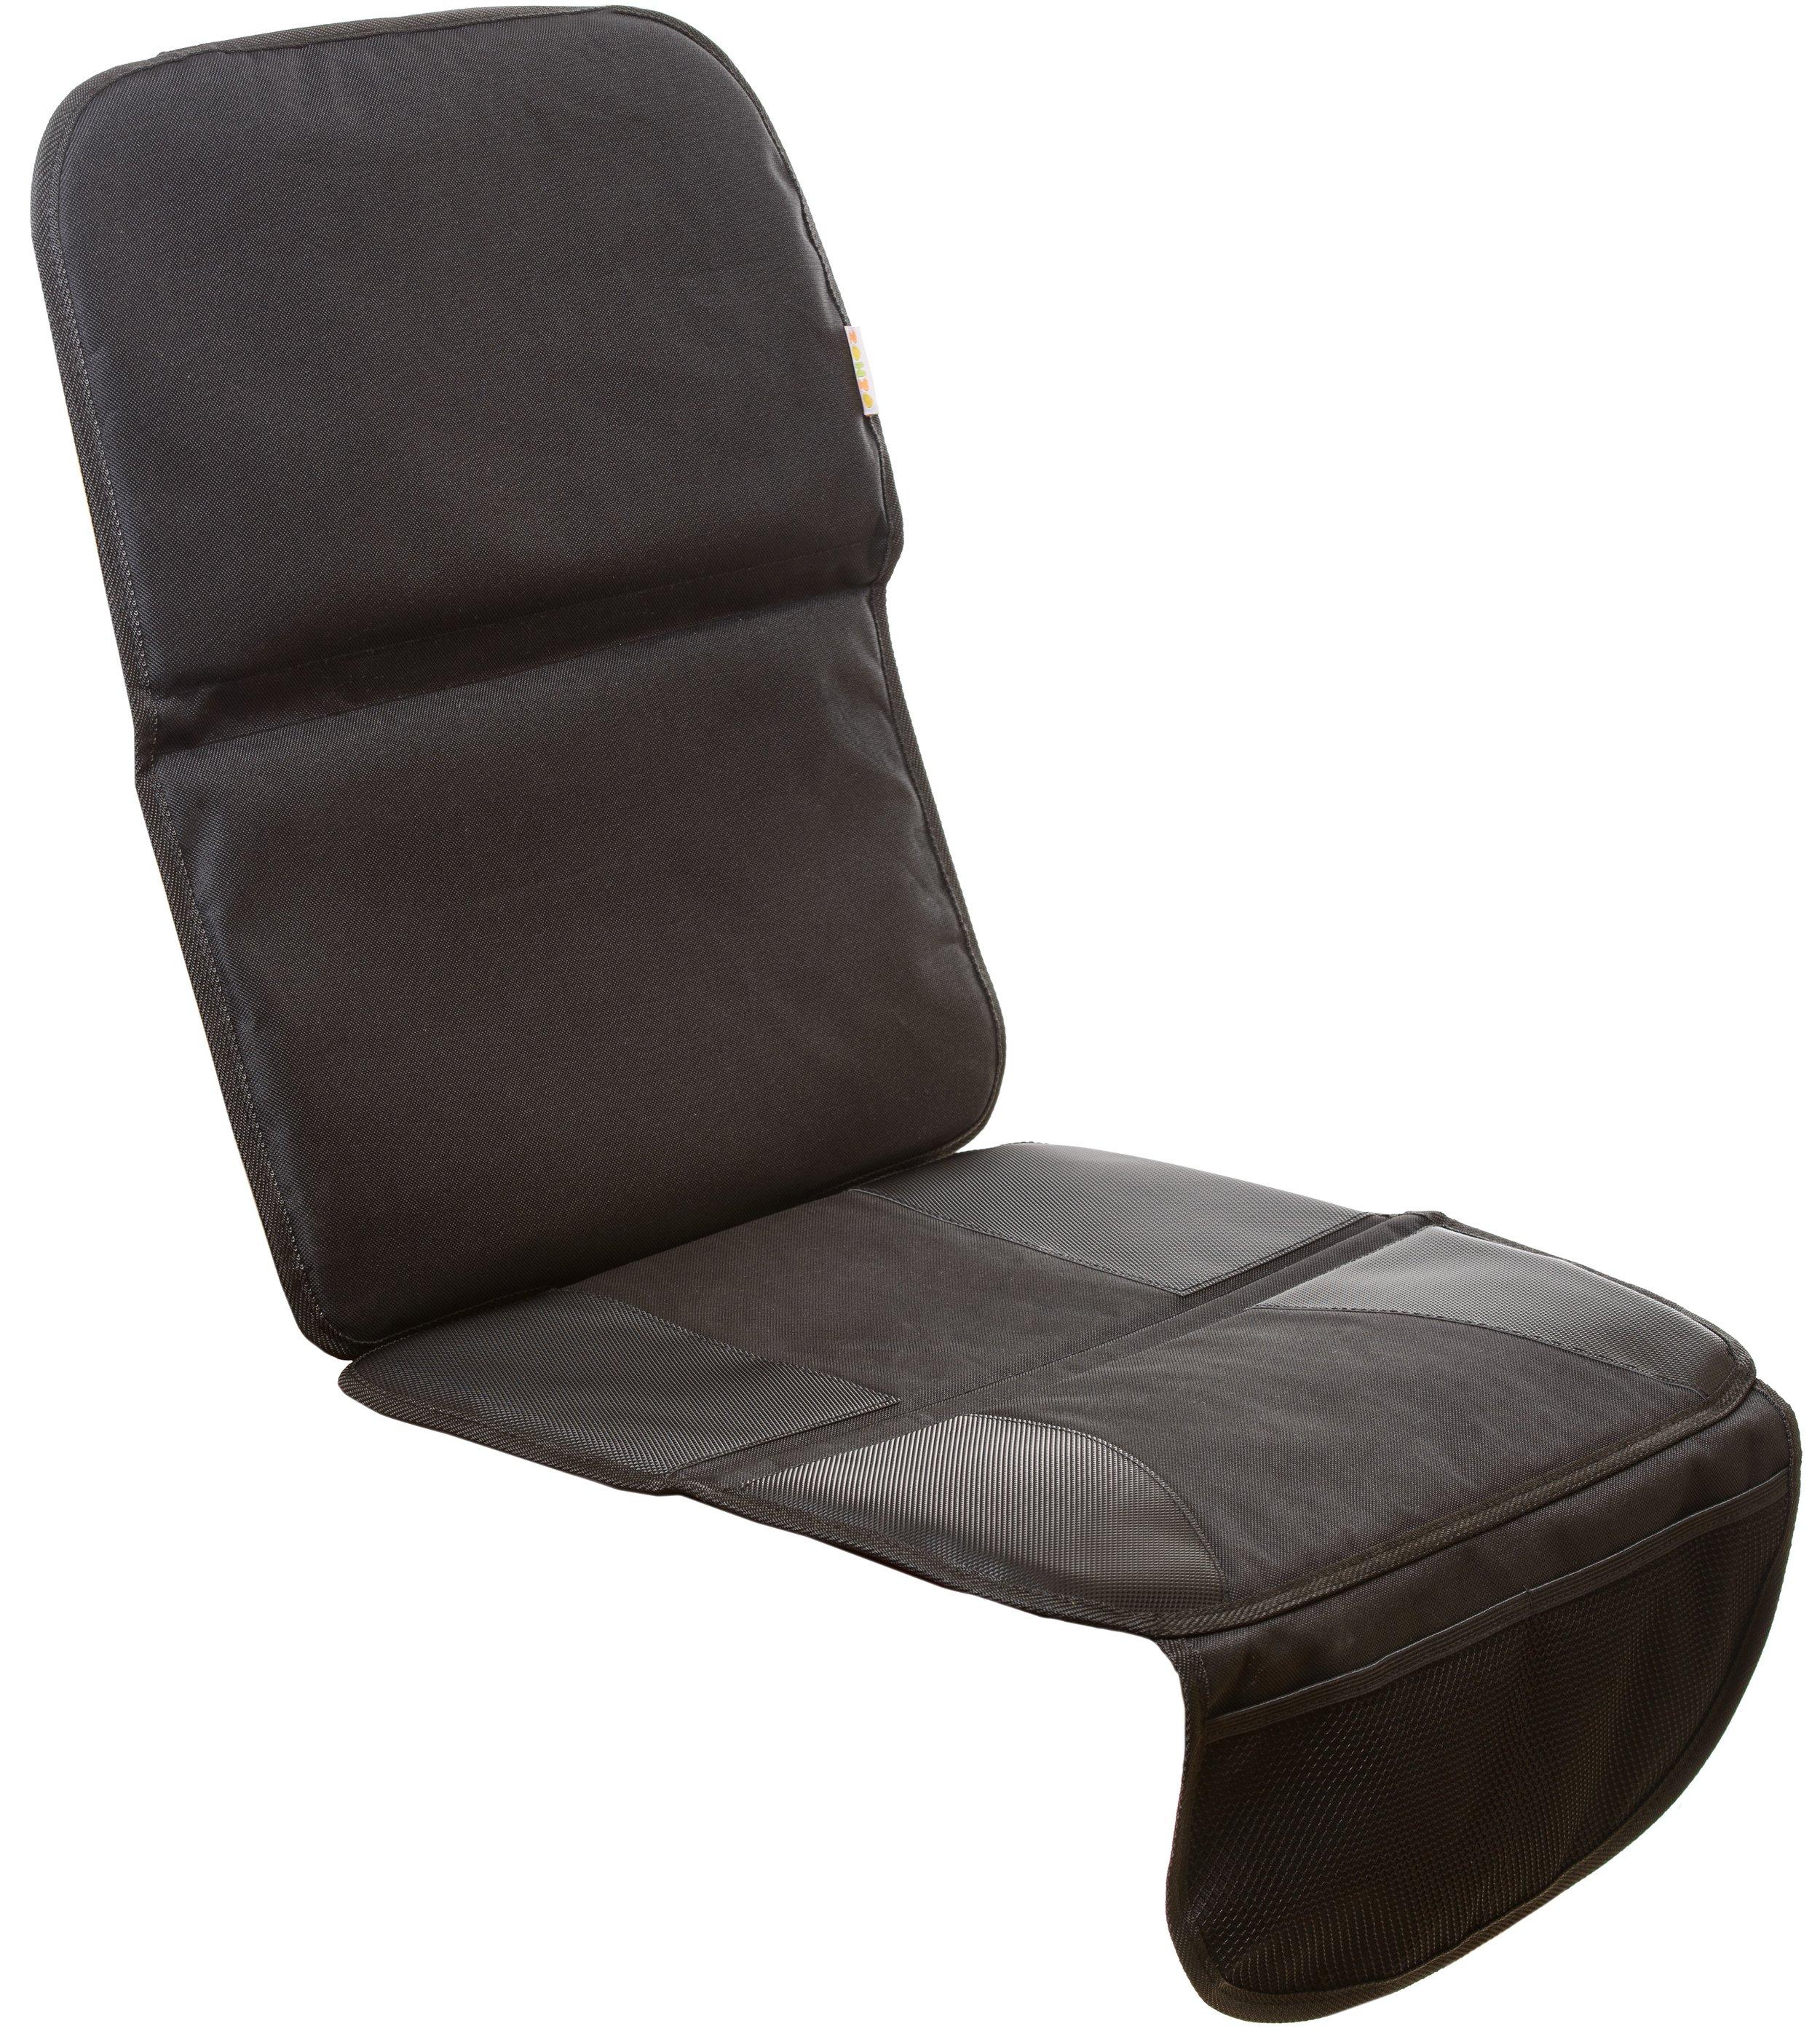 zohzo_car_seat_protector_main_2.jpg